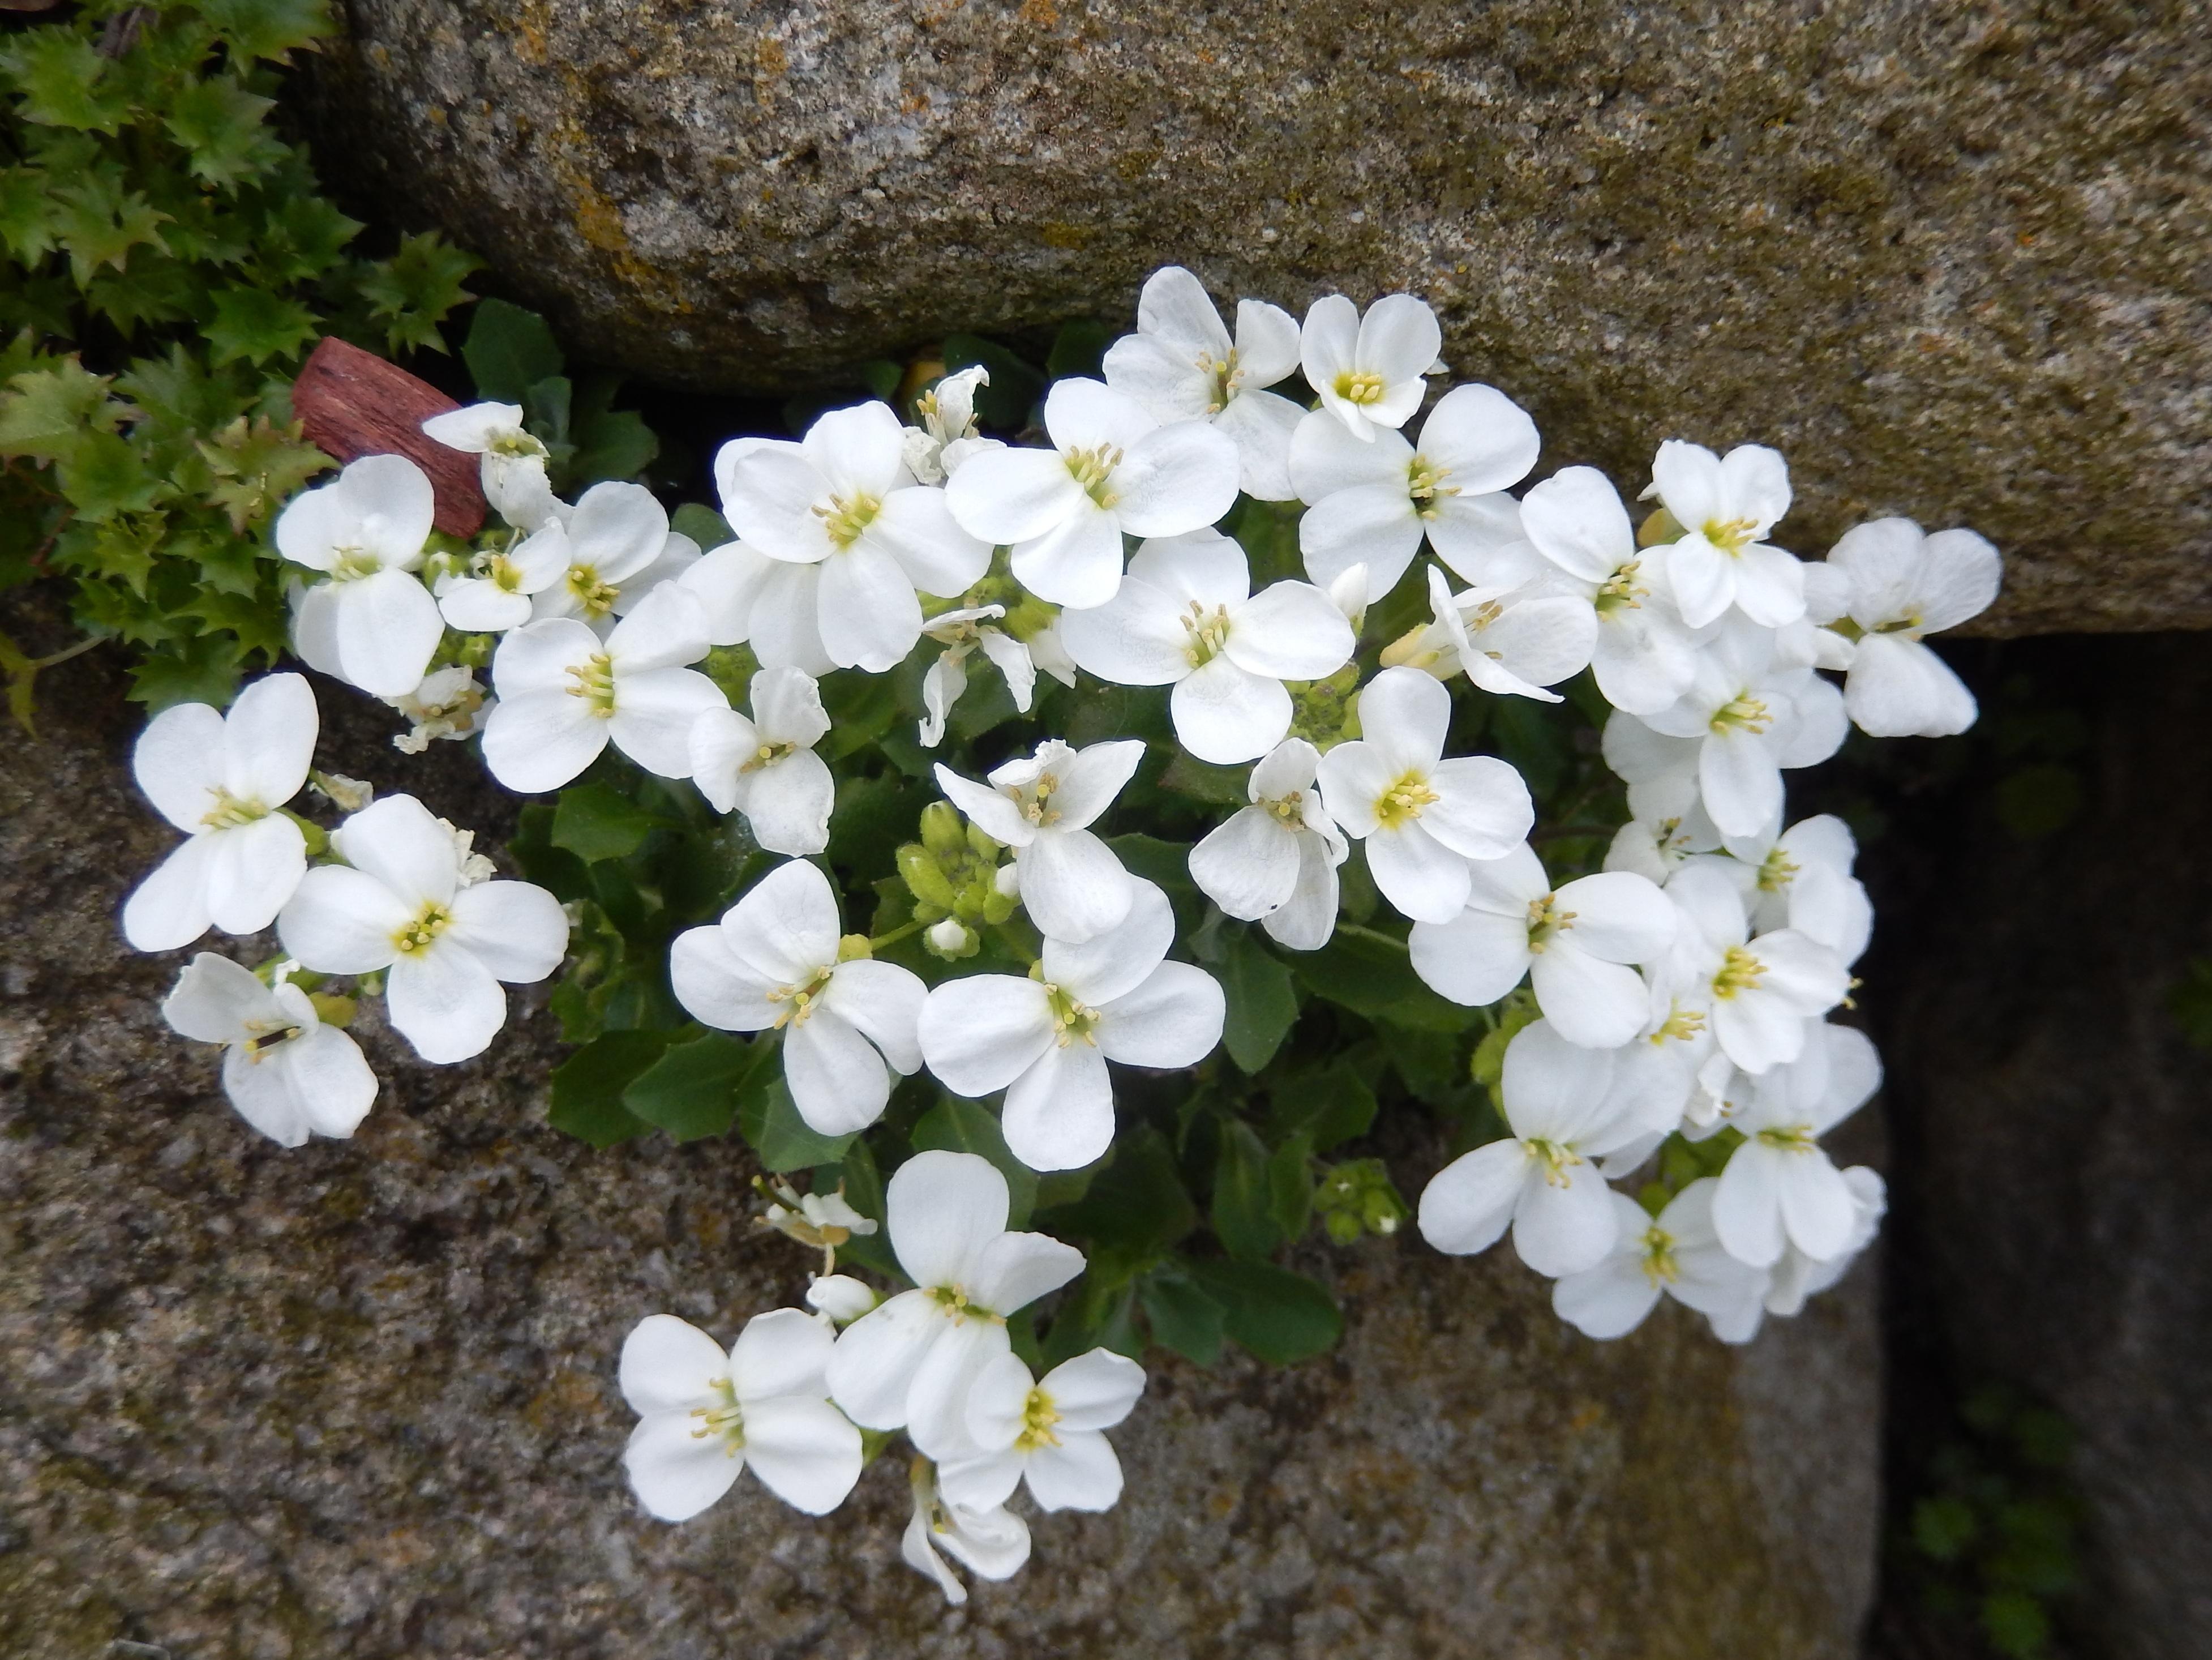 Free Images Nature Blossom White Bloom Botany Flora